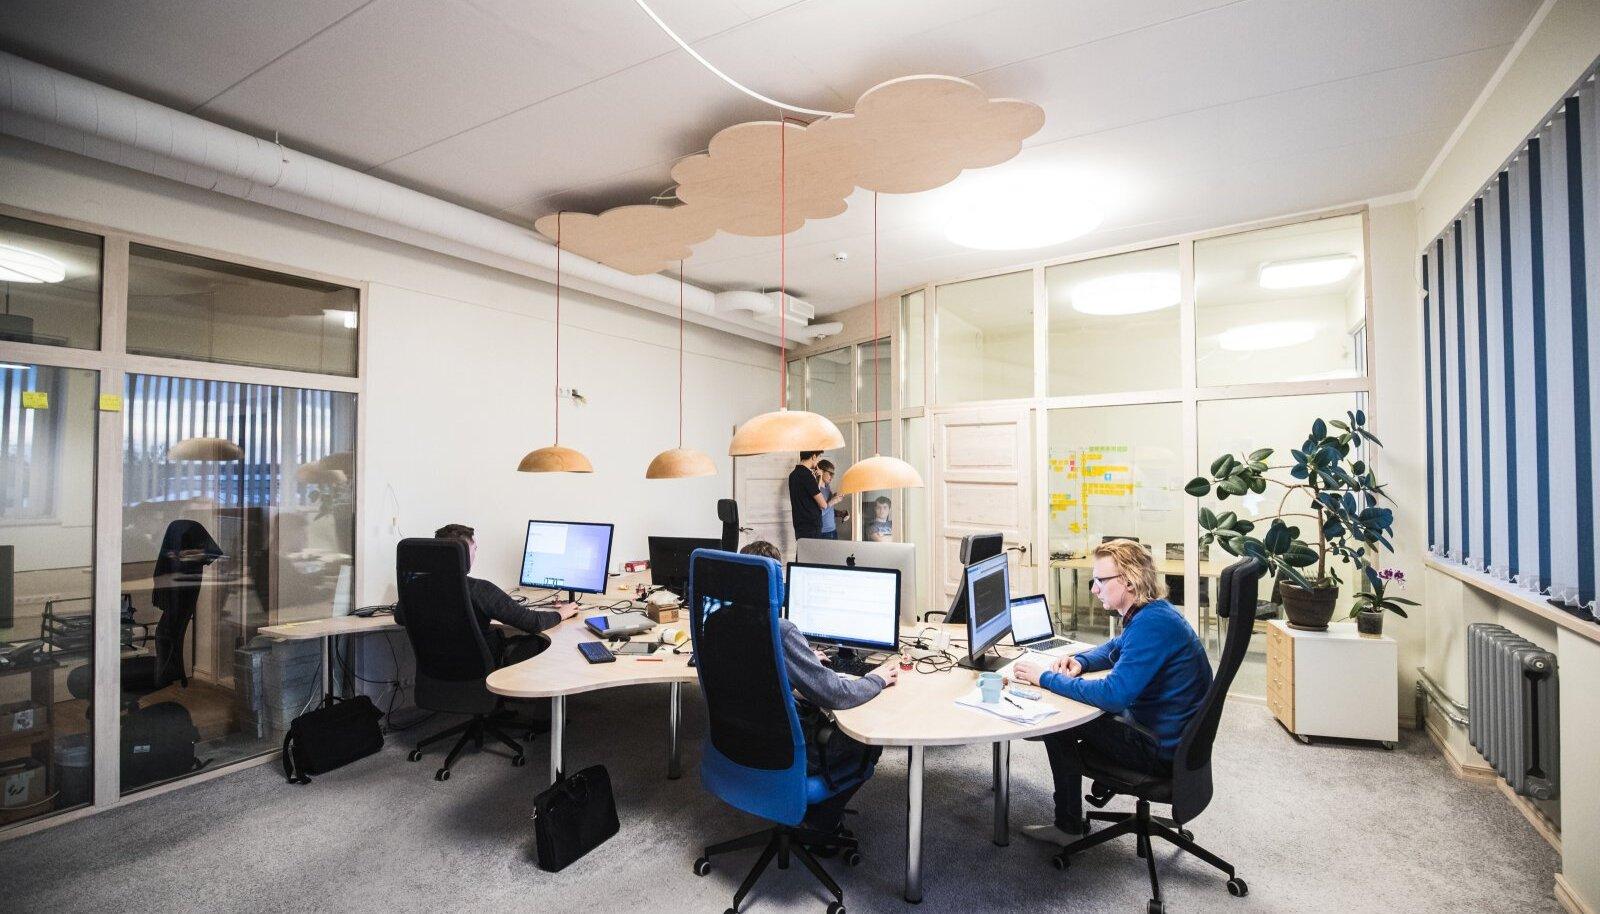 Eziil kontor